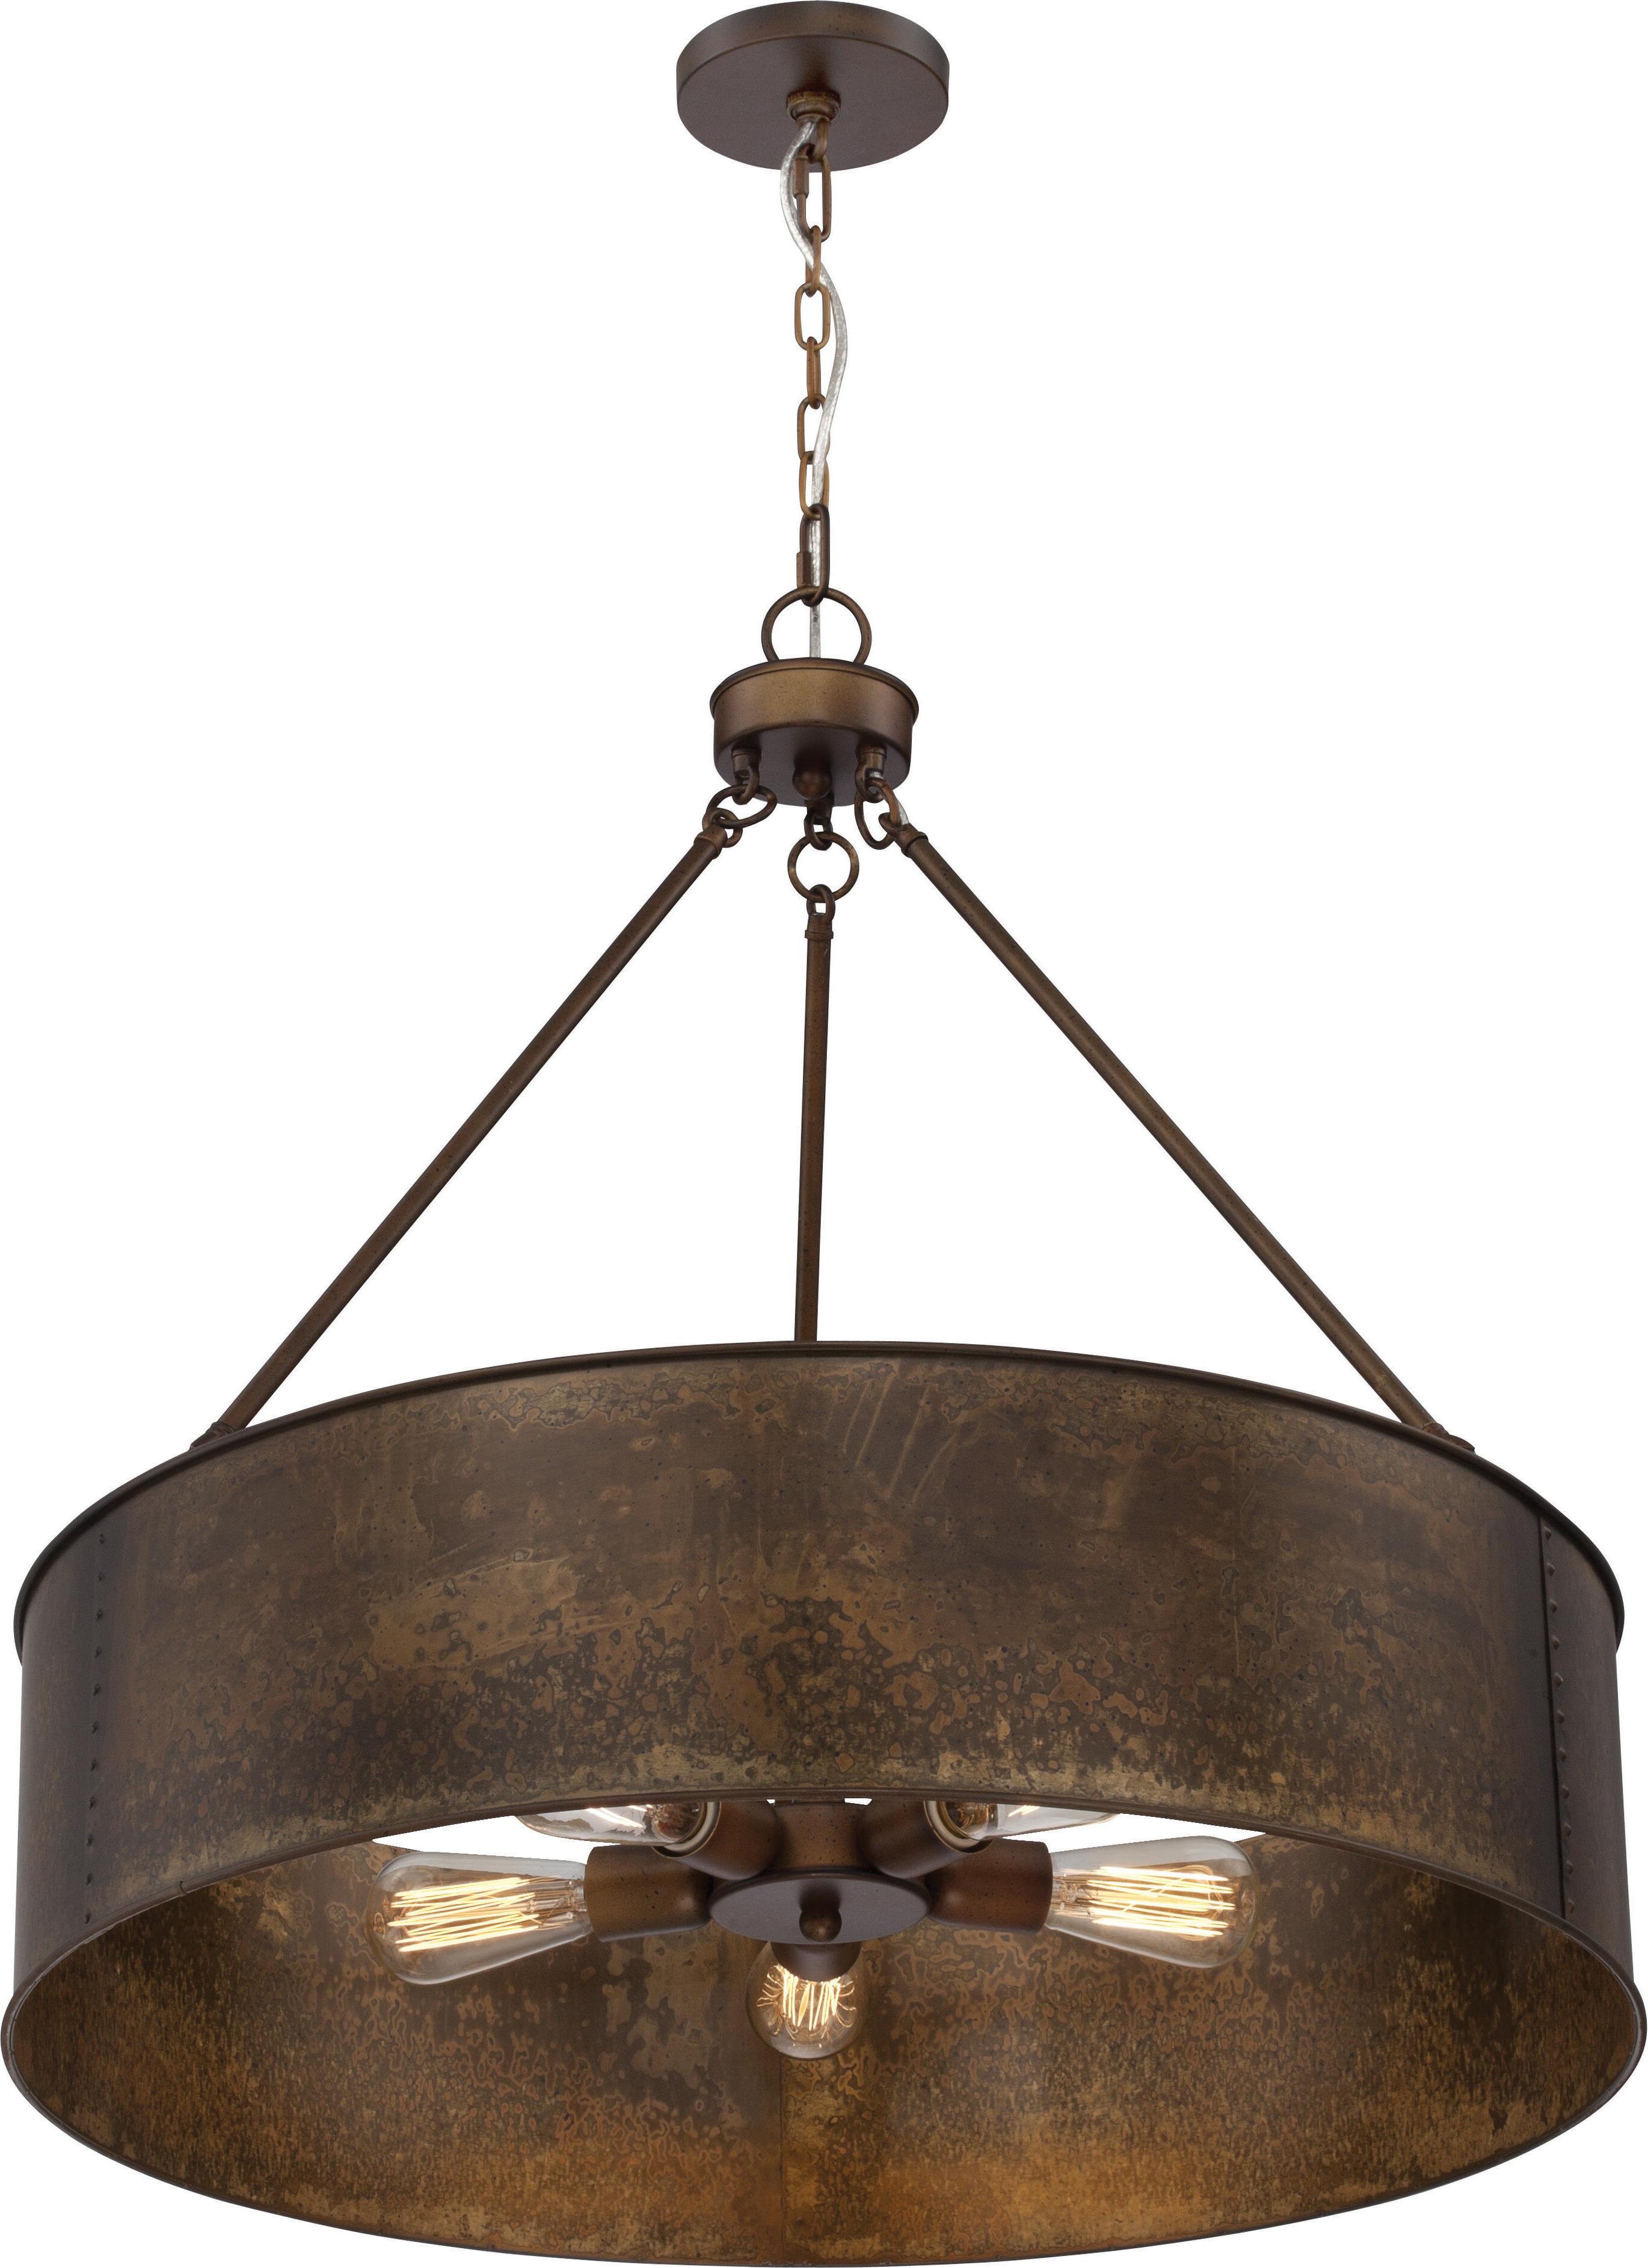 Birch Lane for Irwin 1-Light Single Globe Pendants